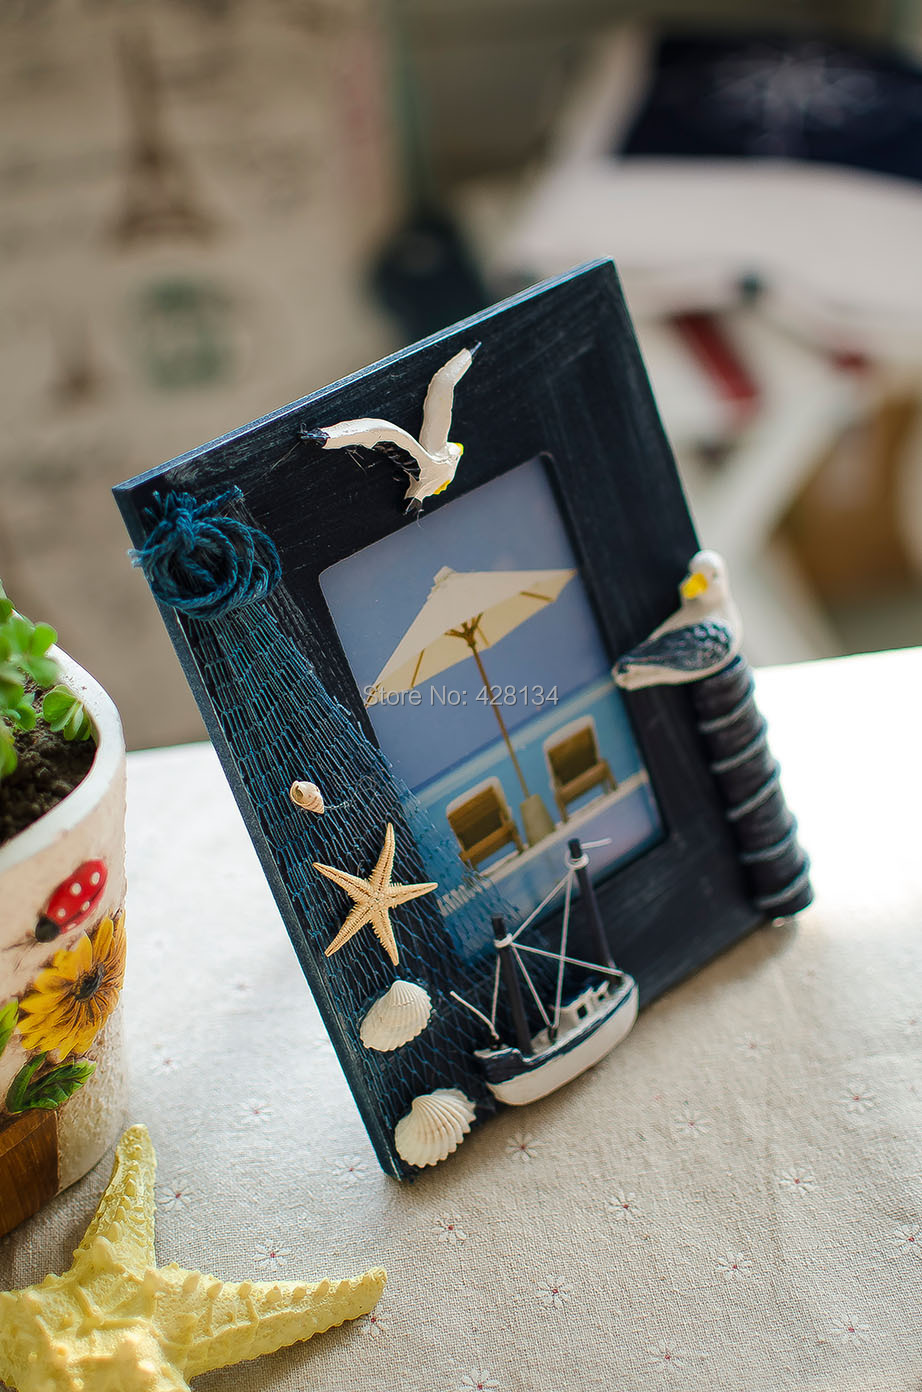 Ocean Blue Pinewood Handmade Photo Frame, Beach Sand Series (C0424), Pure handmade, 3*5 photo, ON SALE! - China TreasureHunt Home Decoration Co. Ltd. store